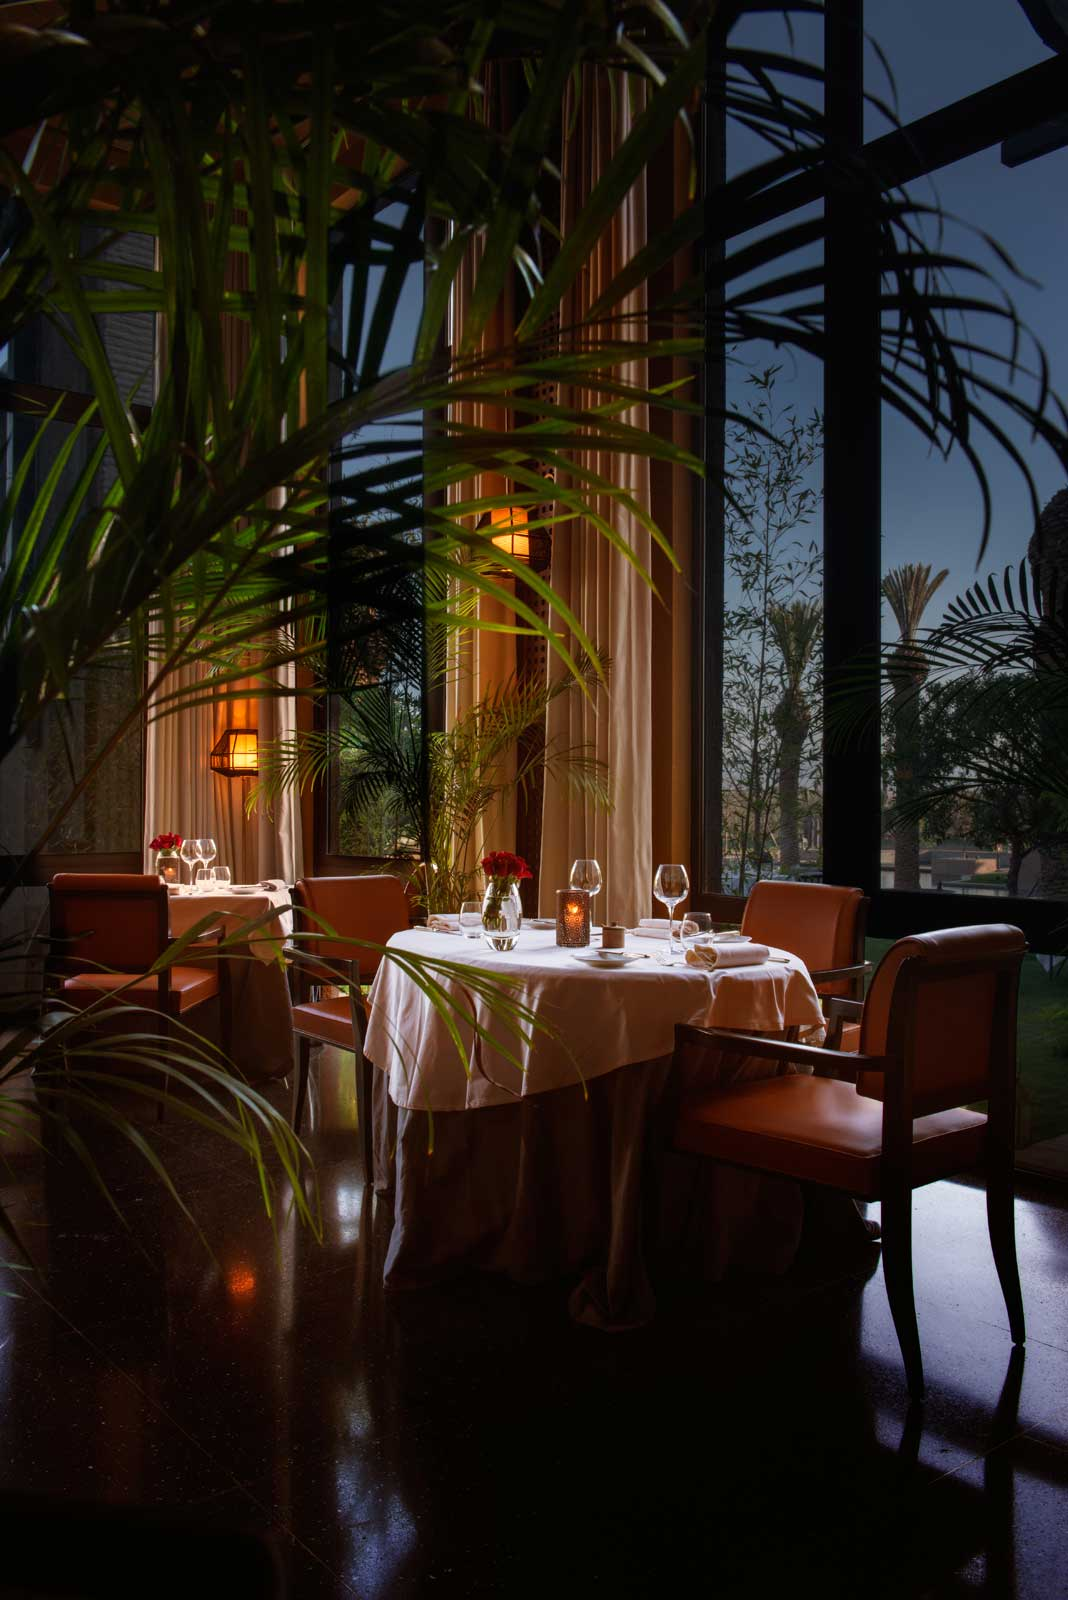 Royal Palm Marrakech, nell'Oasi del Re